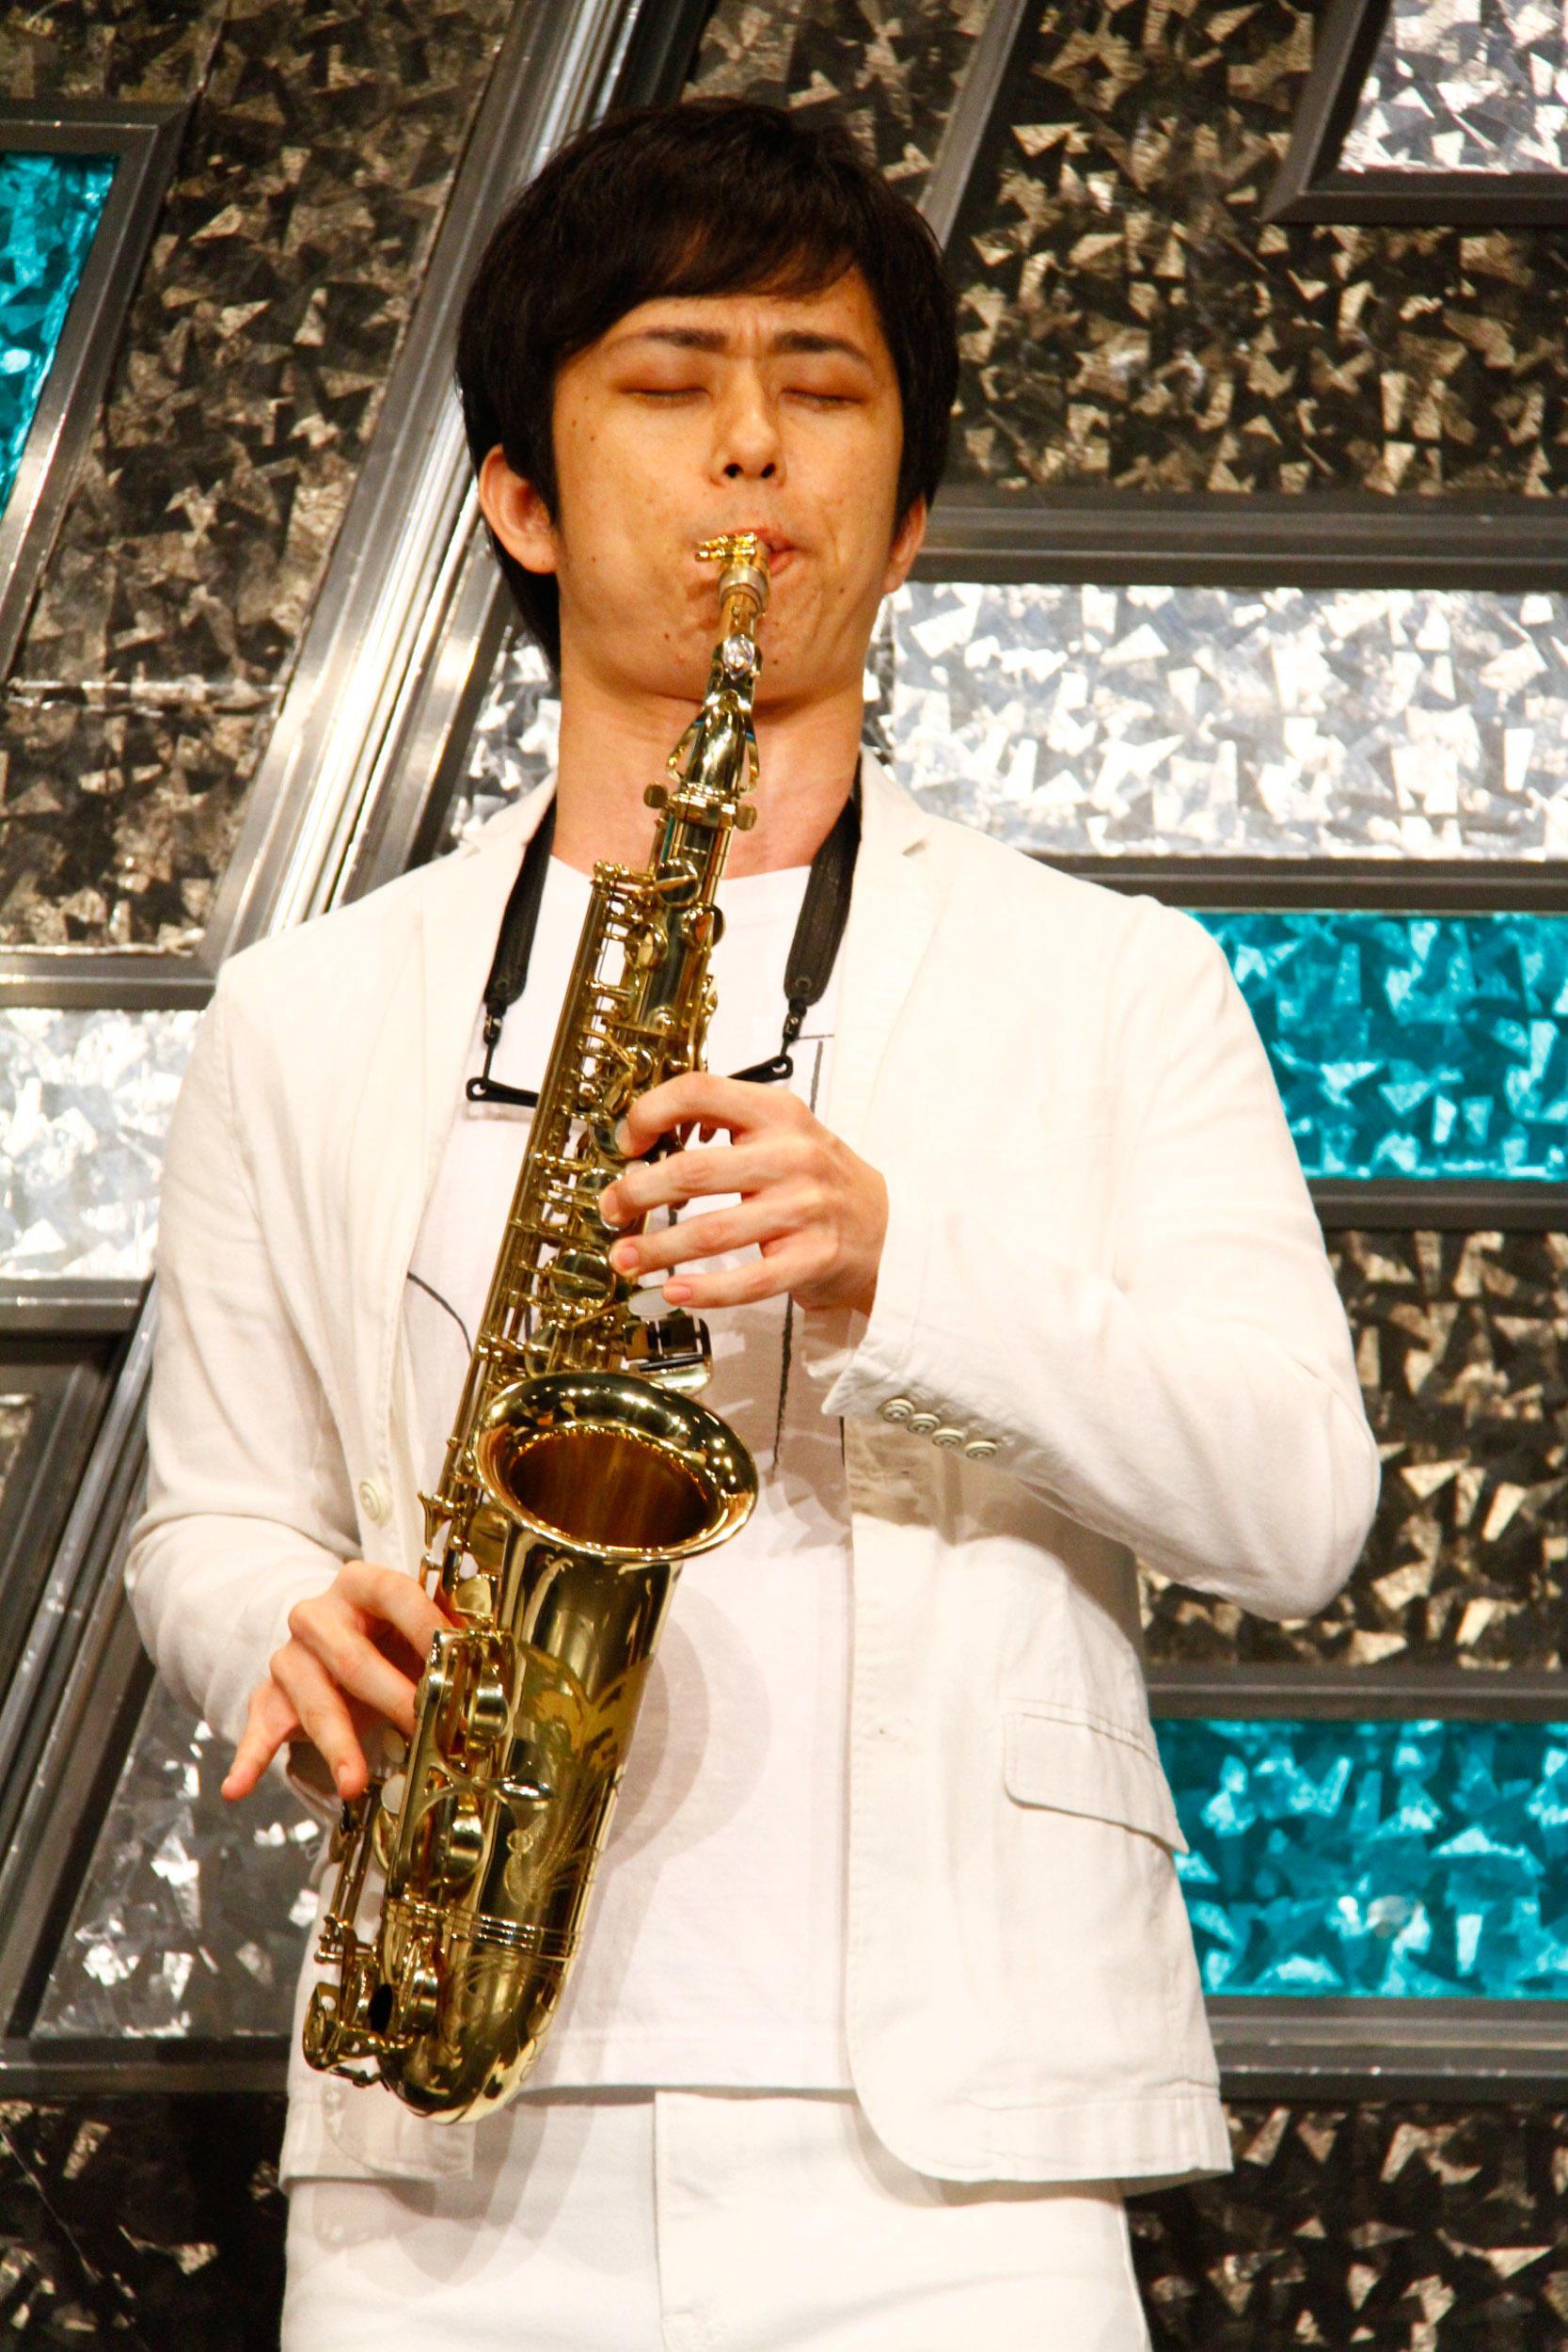 http://news.yoshimoto.co.jp/20180628163401-512a9ce46d92ed47ab3d29fd3f99b285994409fa.jpg